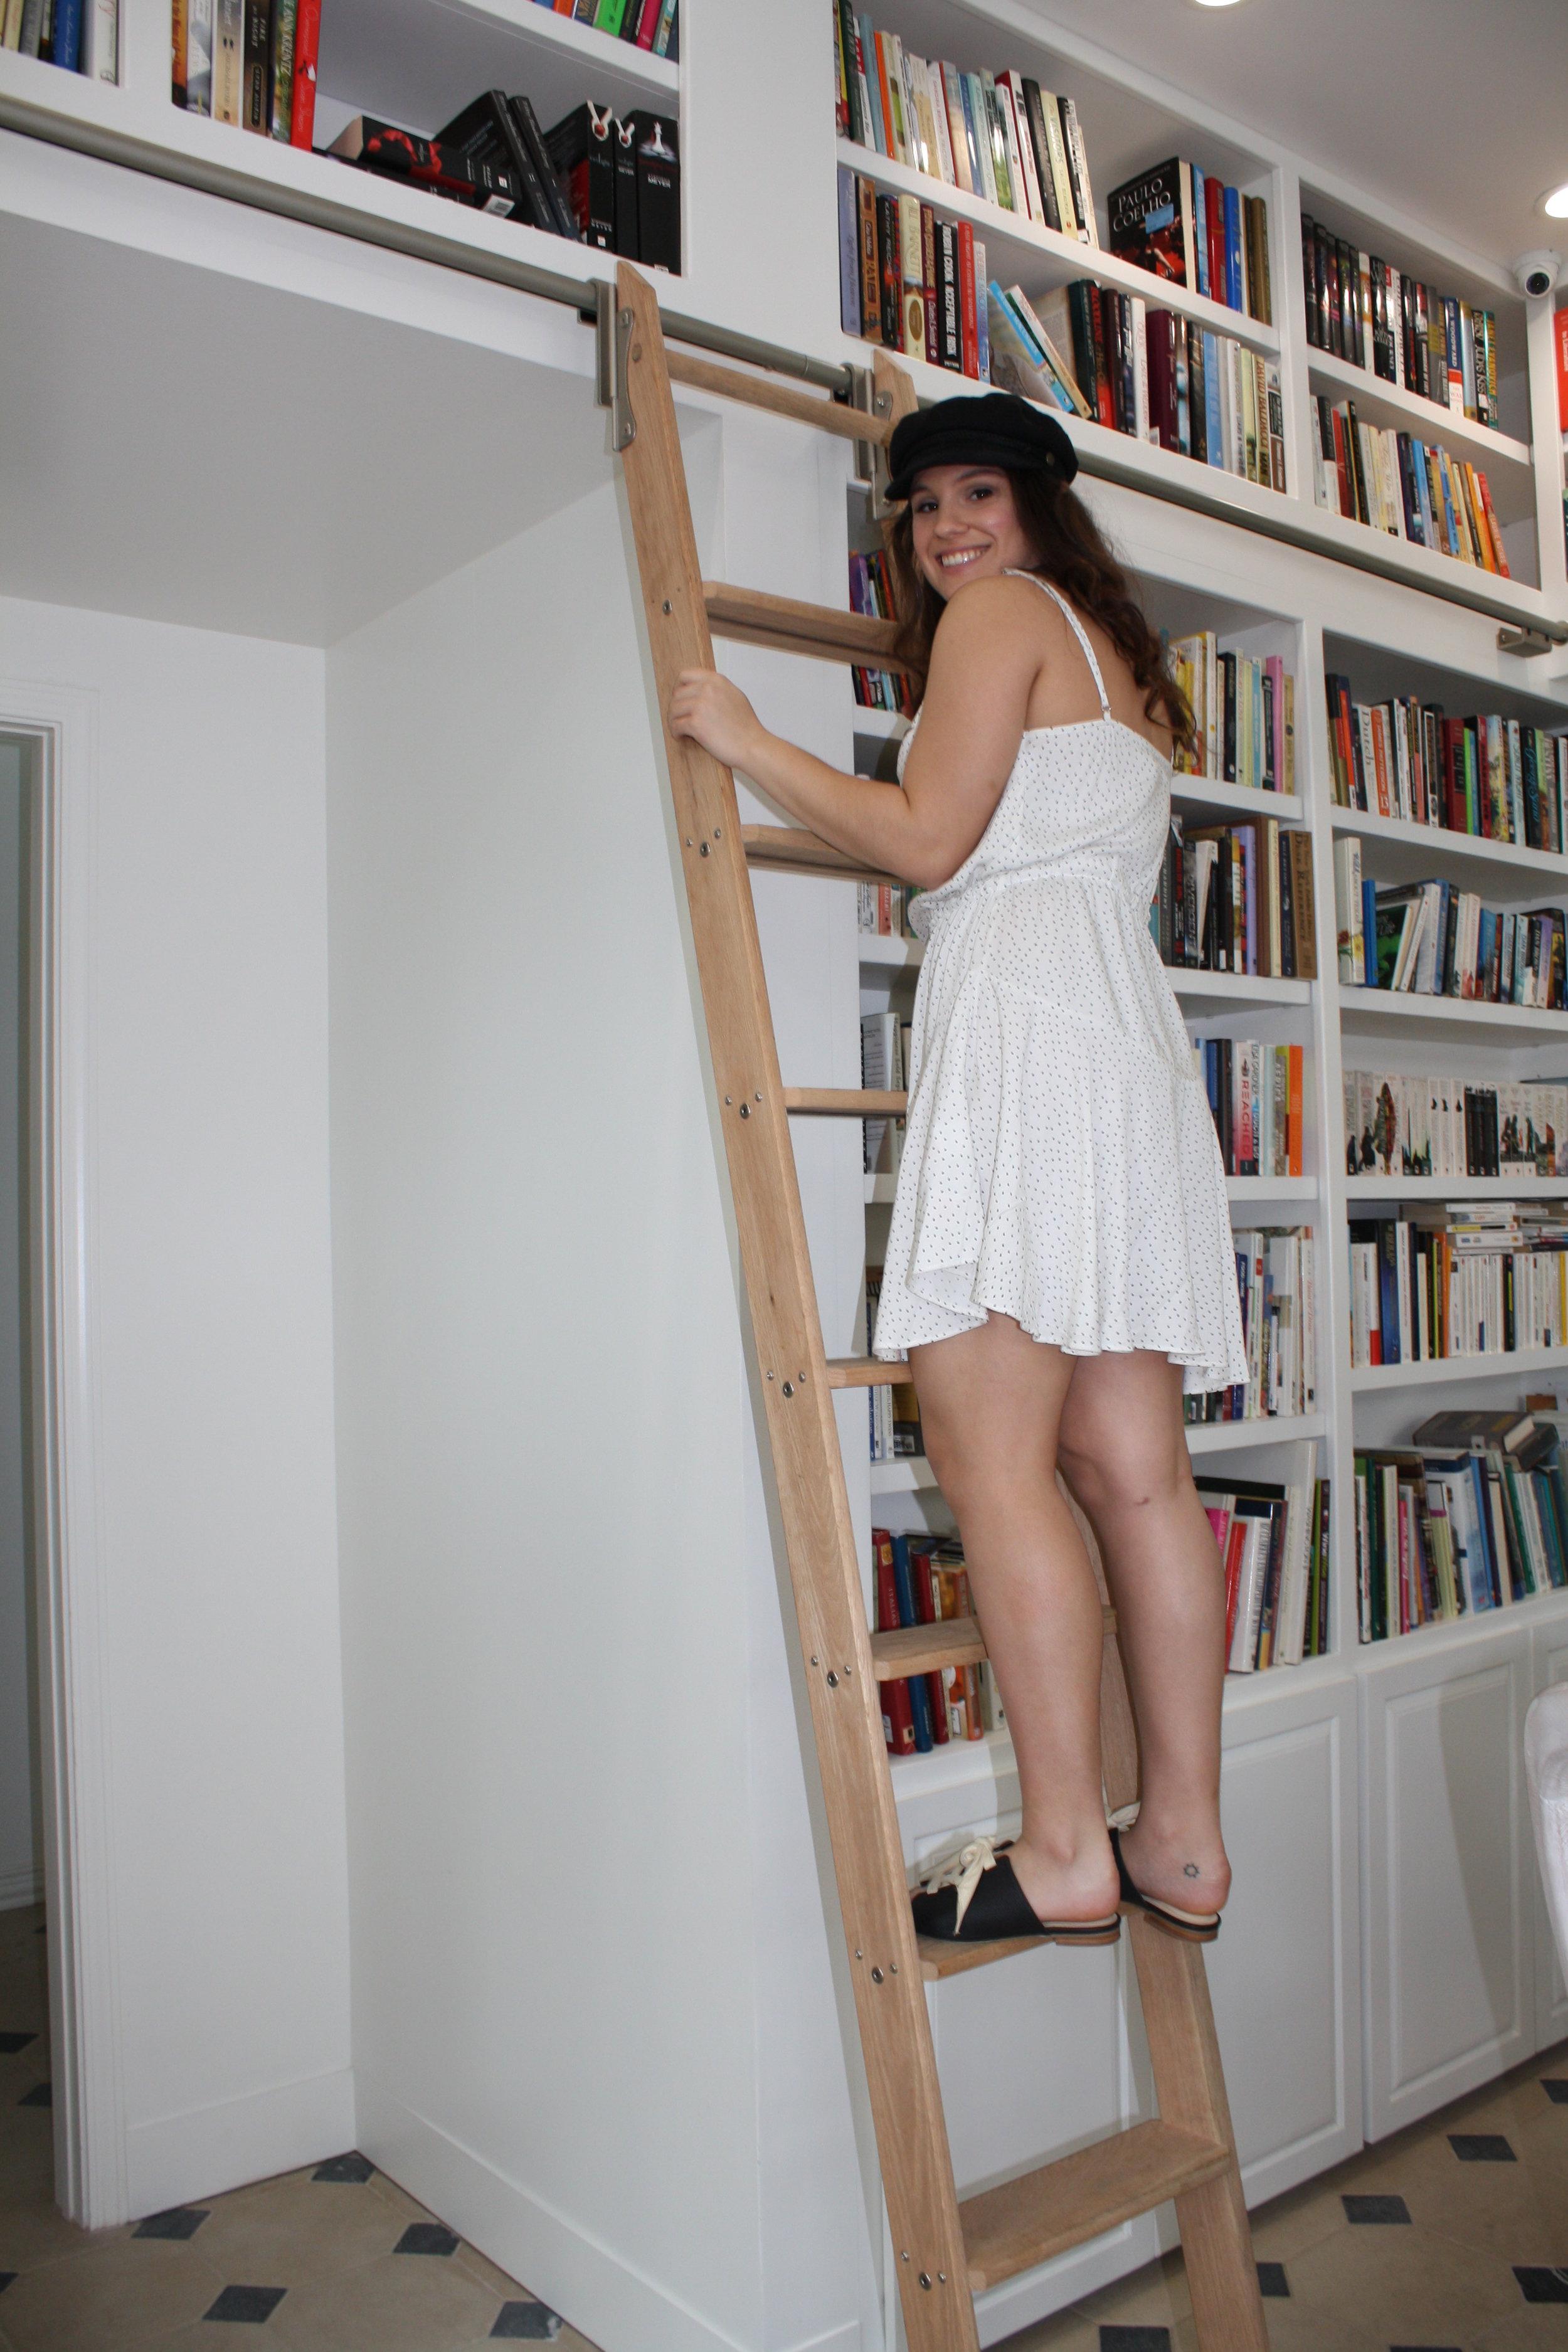 Hat: Brixton;Dress: MinkPink; Shoes: Matisse